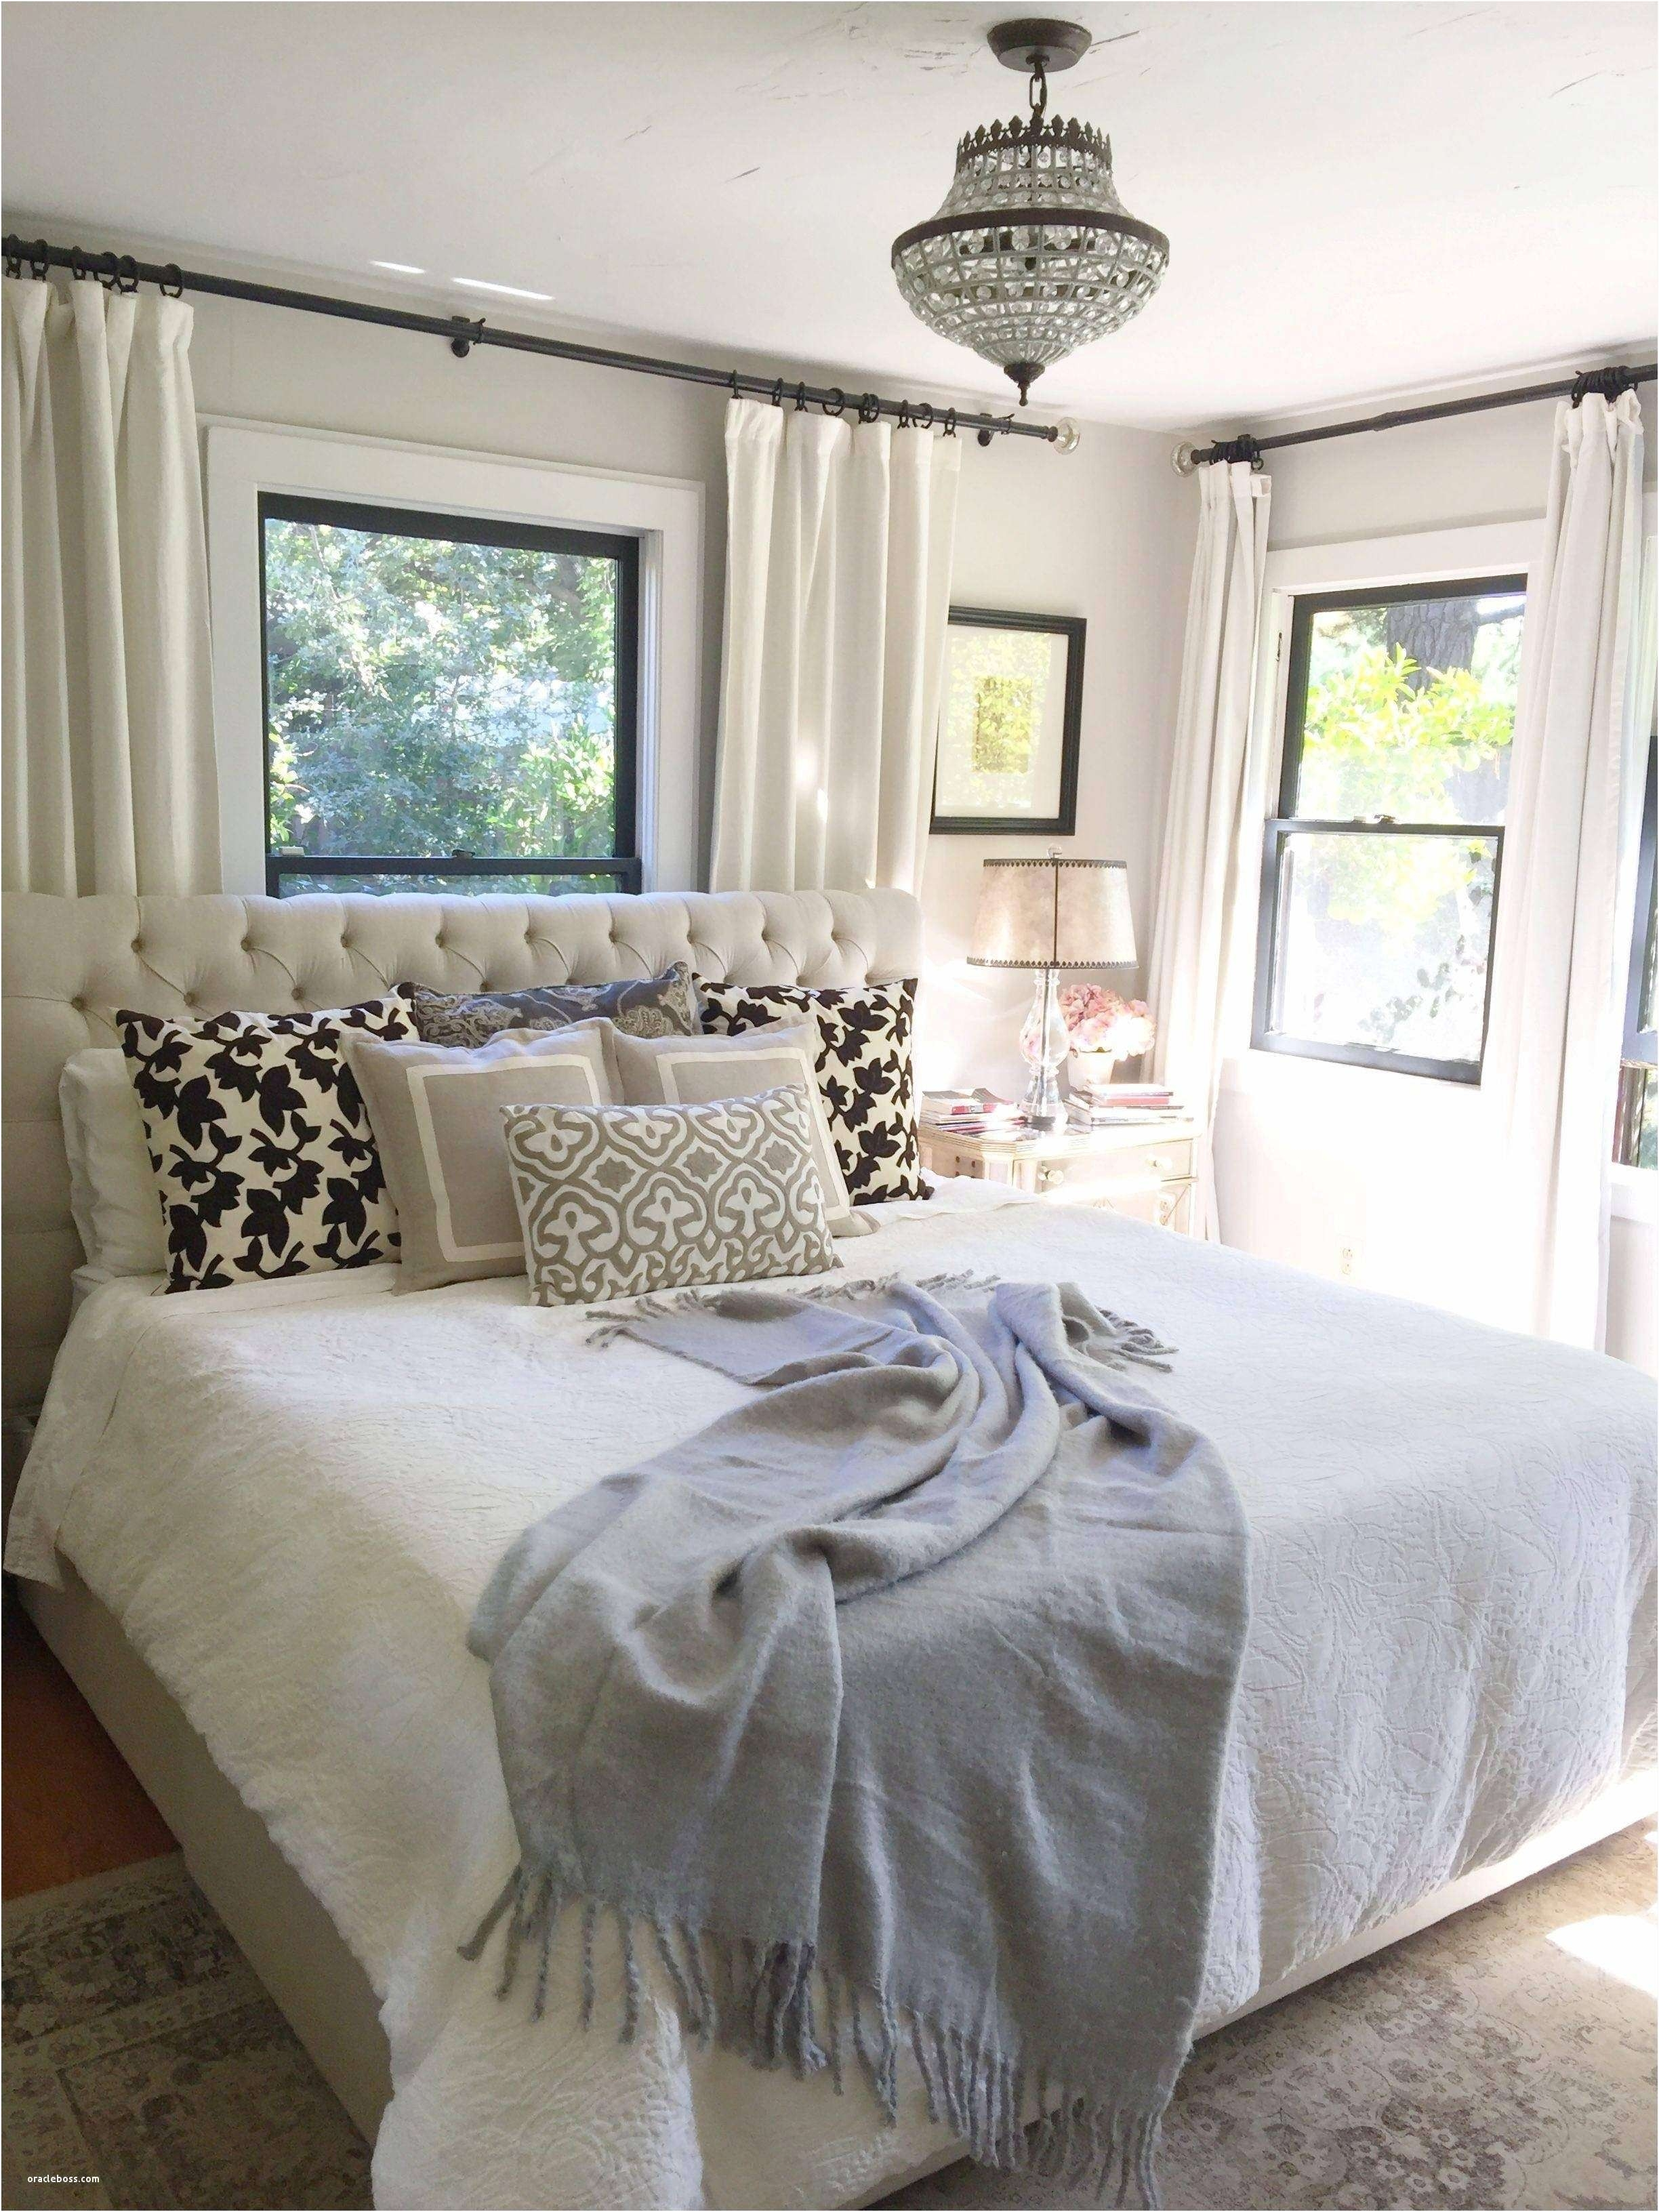 Bedroom Ideas White Best Gold Bedroom Ideas Elegant Grey Gold Bedroom Best Bedroom Chairs 0d